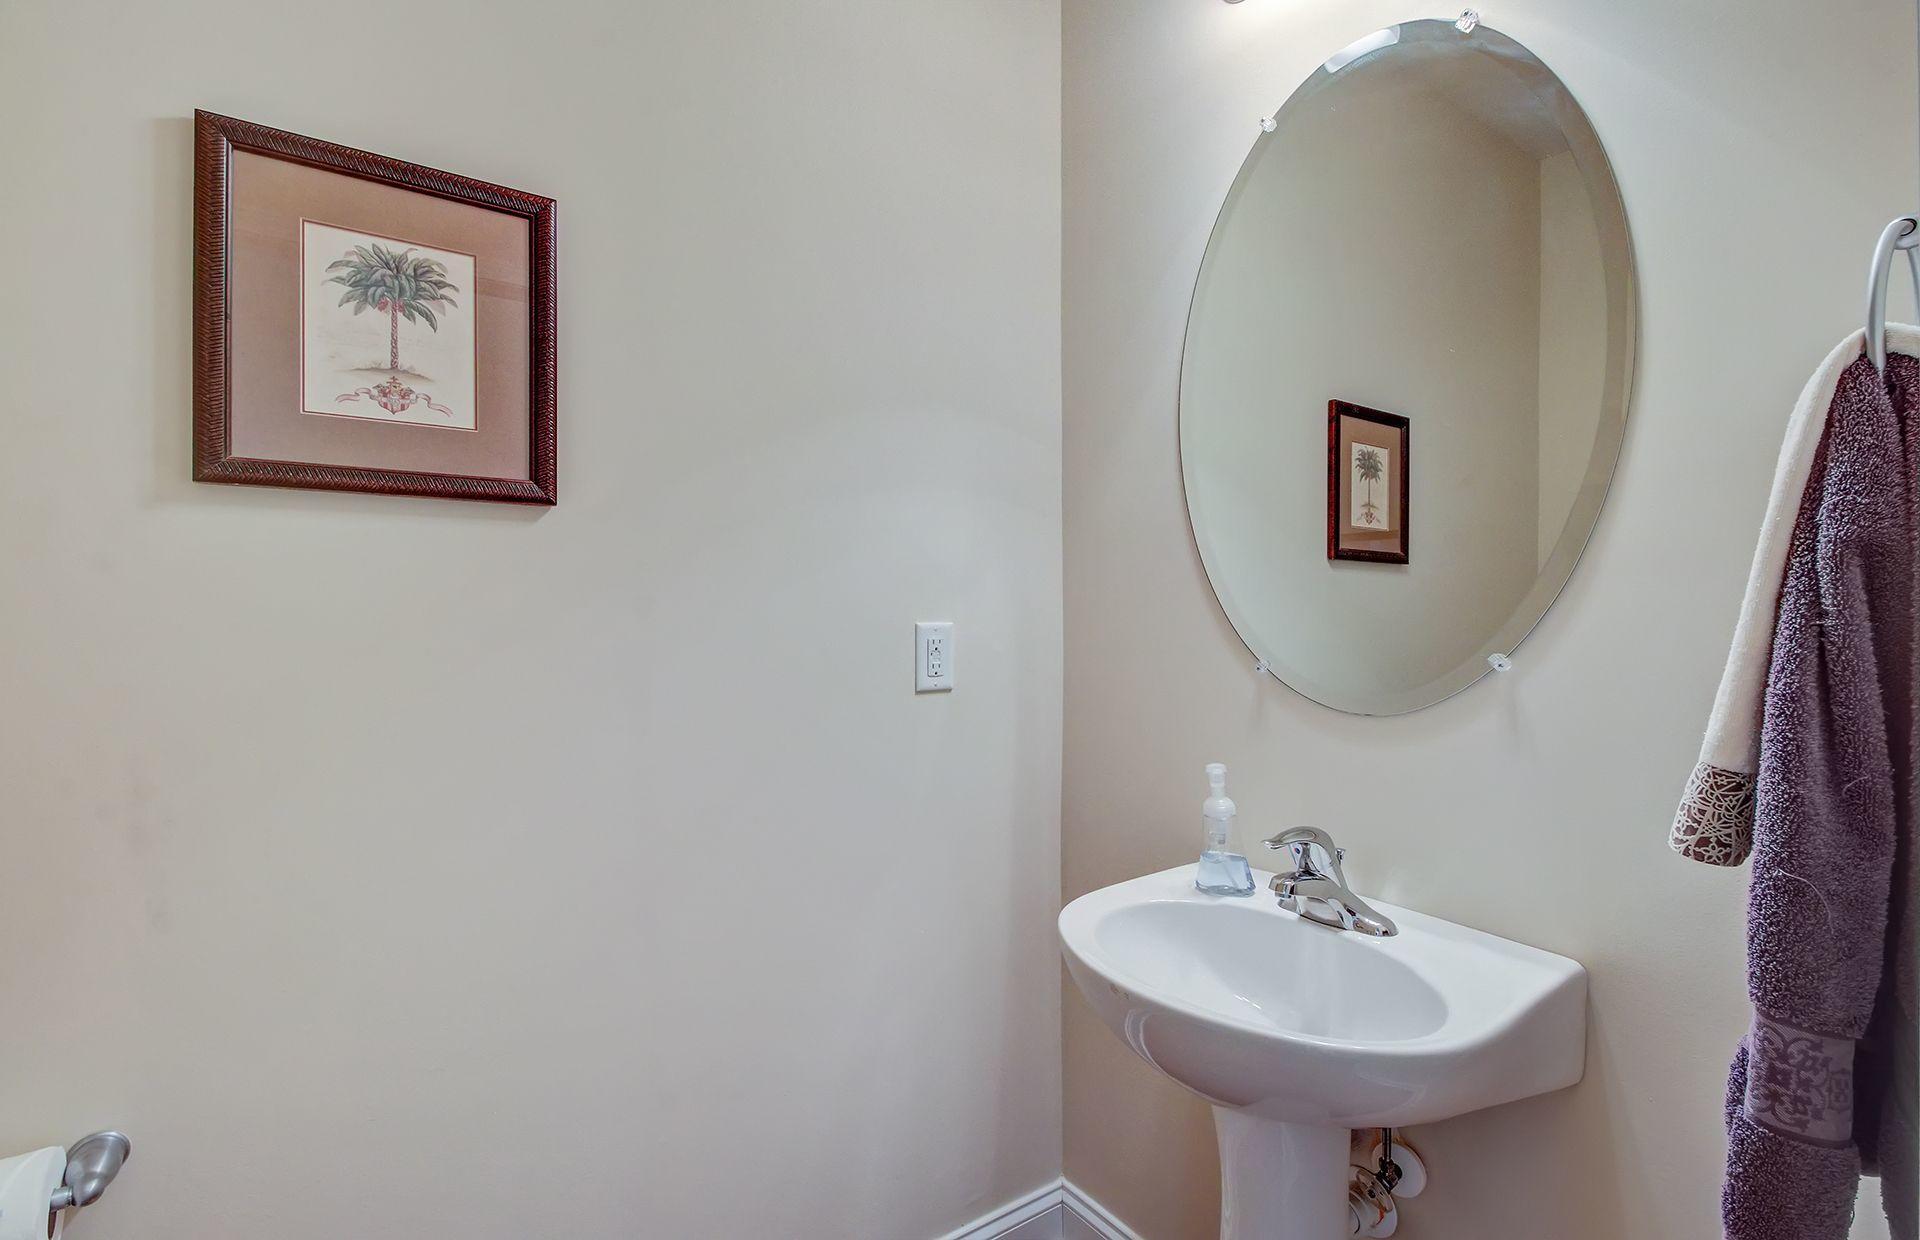 Linnen Place Homes For Sale - 1275 Shingleback, Mount Pleasant, SC - 17